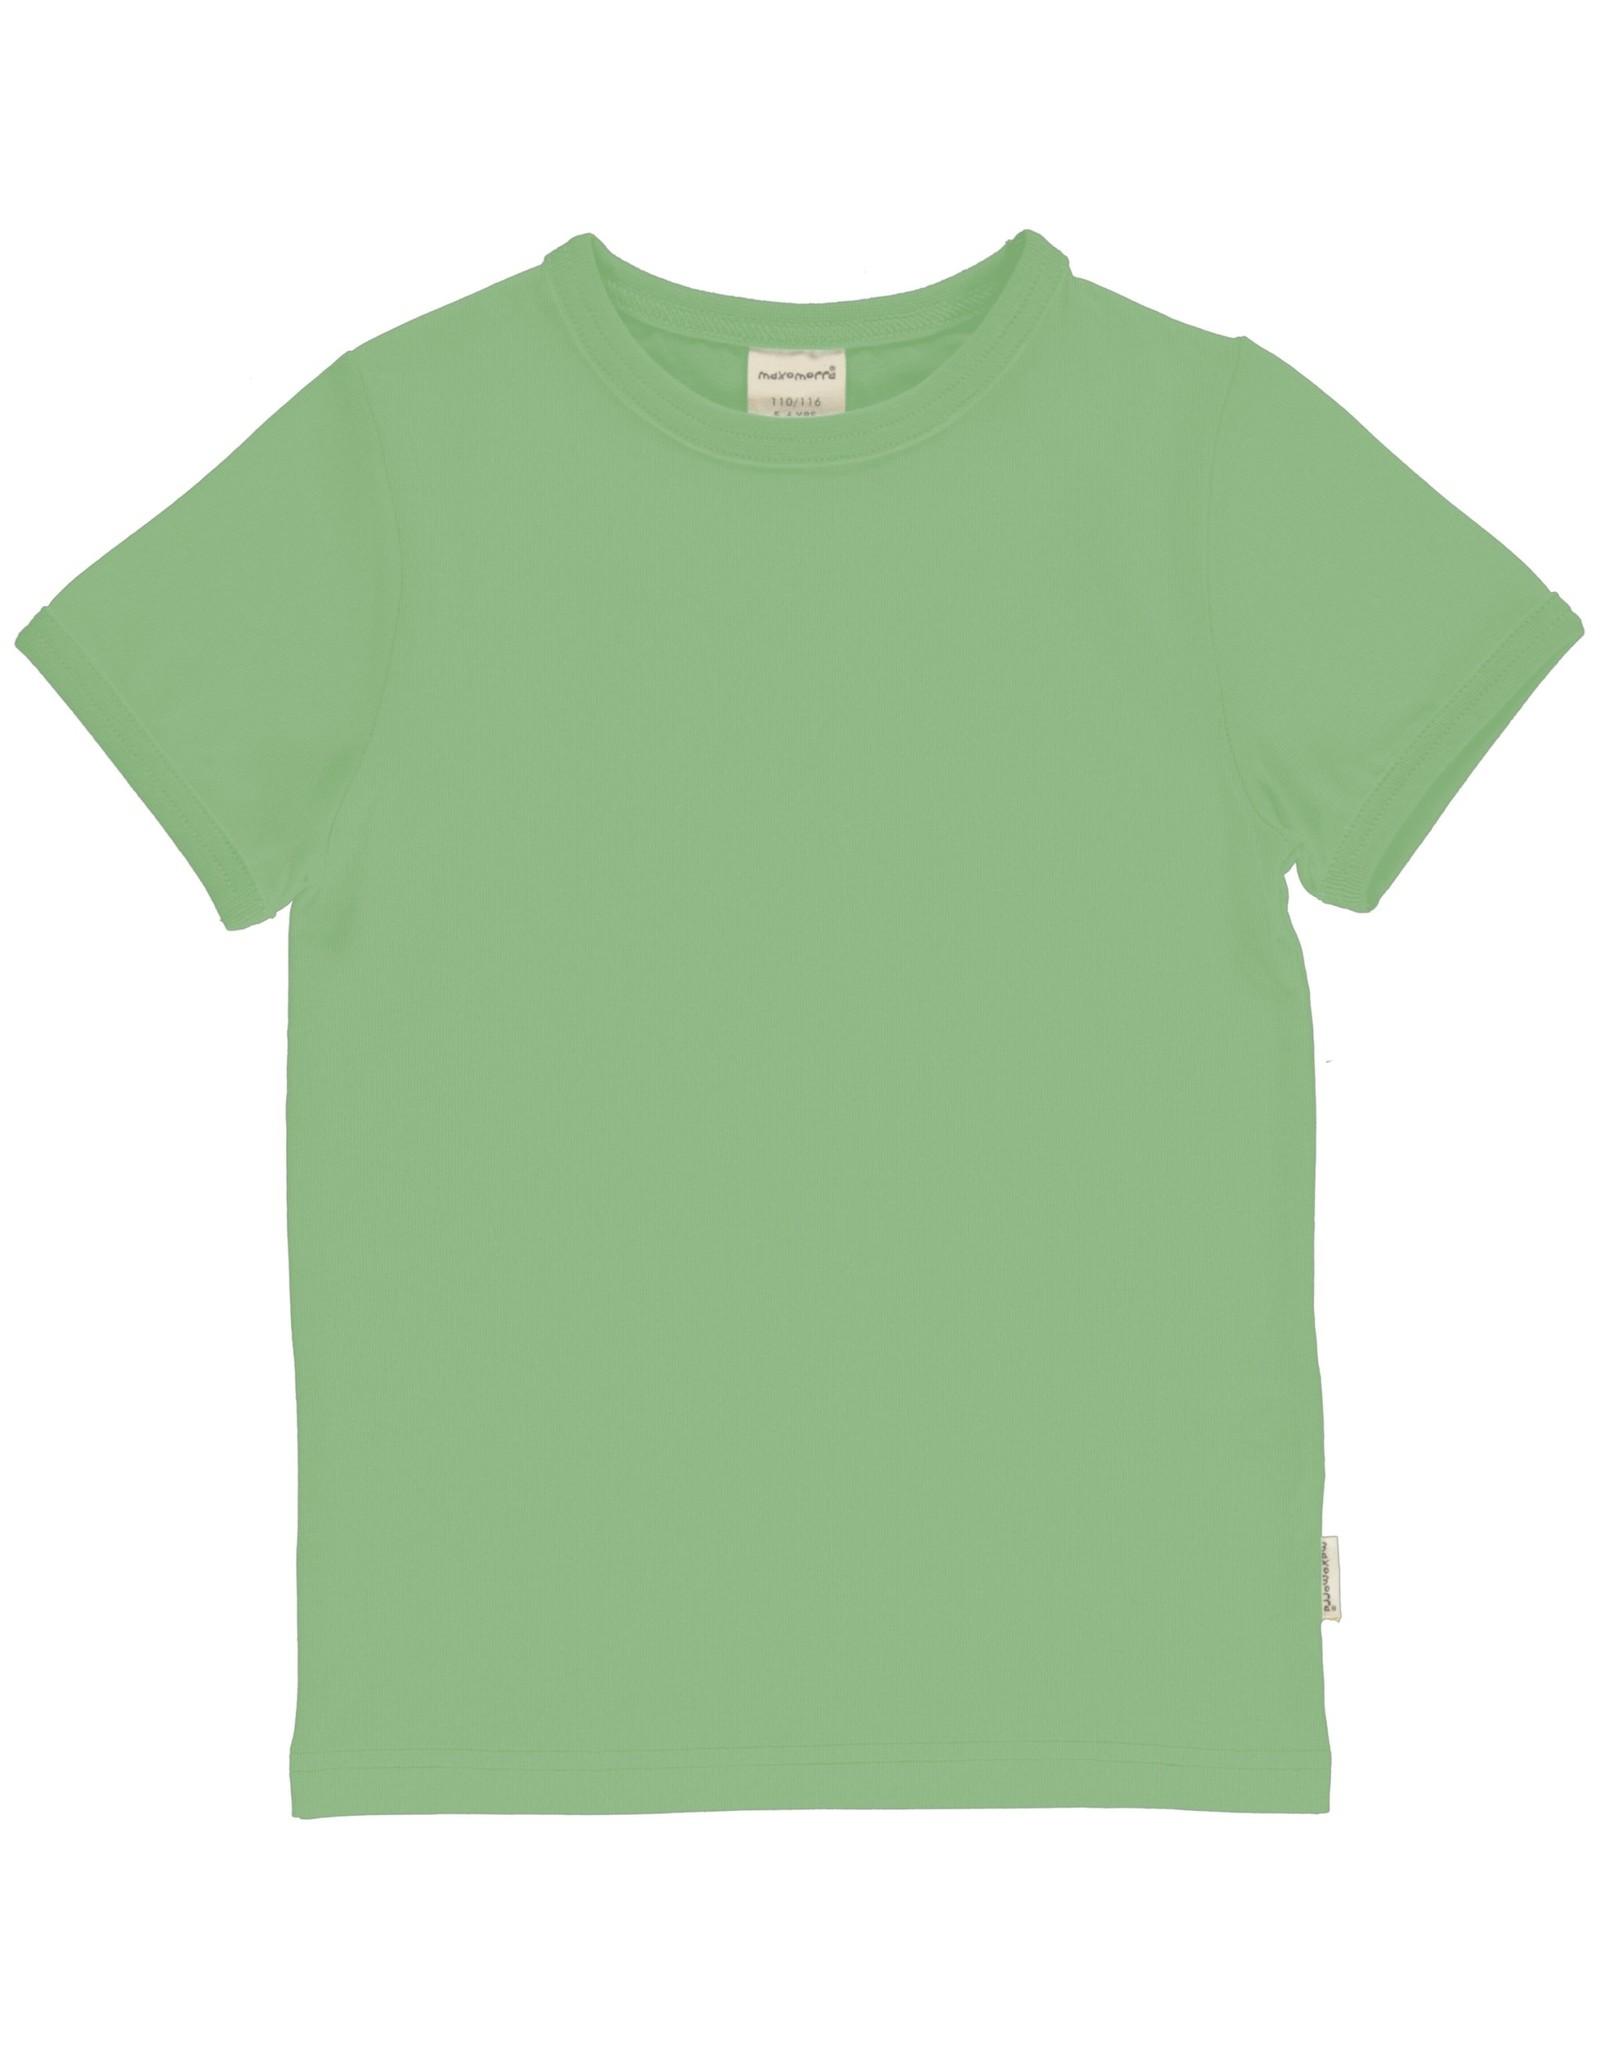 Meyadey Zacht groene basic t-shirt